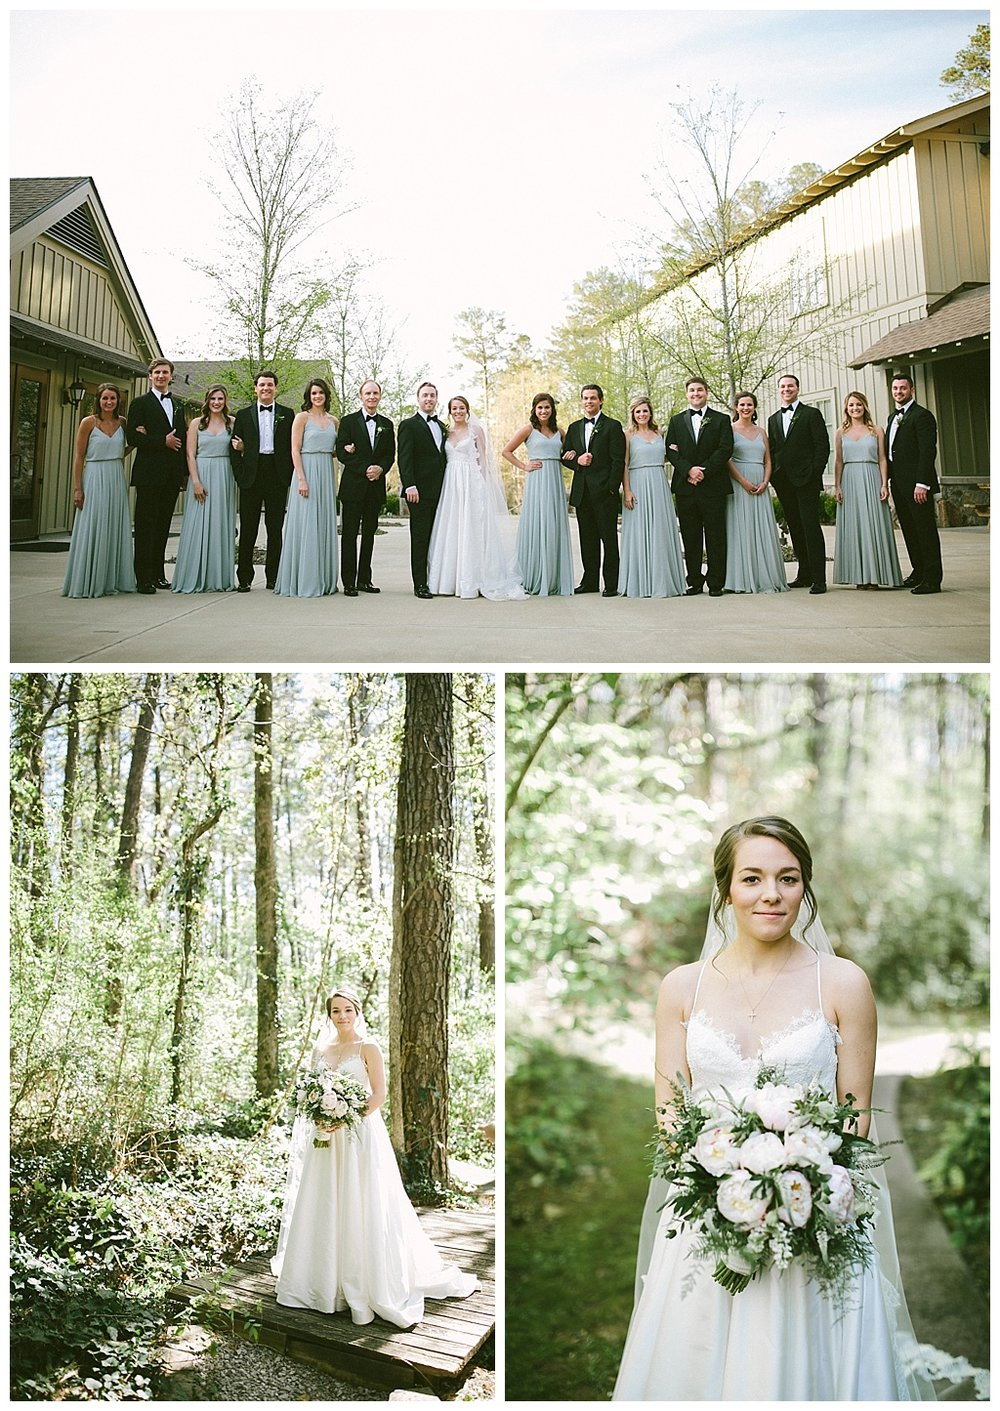 two-hearts-weddings-st-stephens-episcopal-church-avon-theater-birmingham-alabama-wedding_0026.jpg